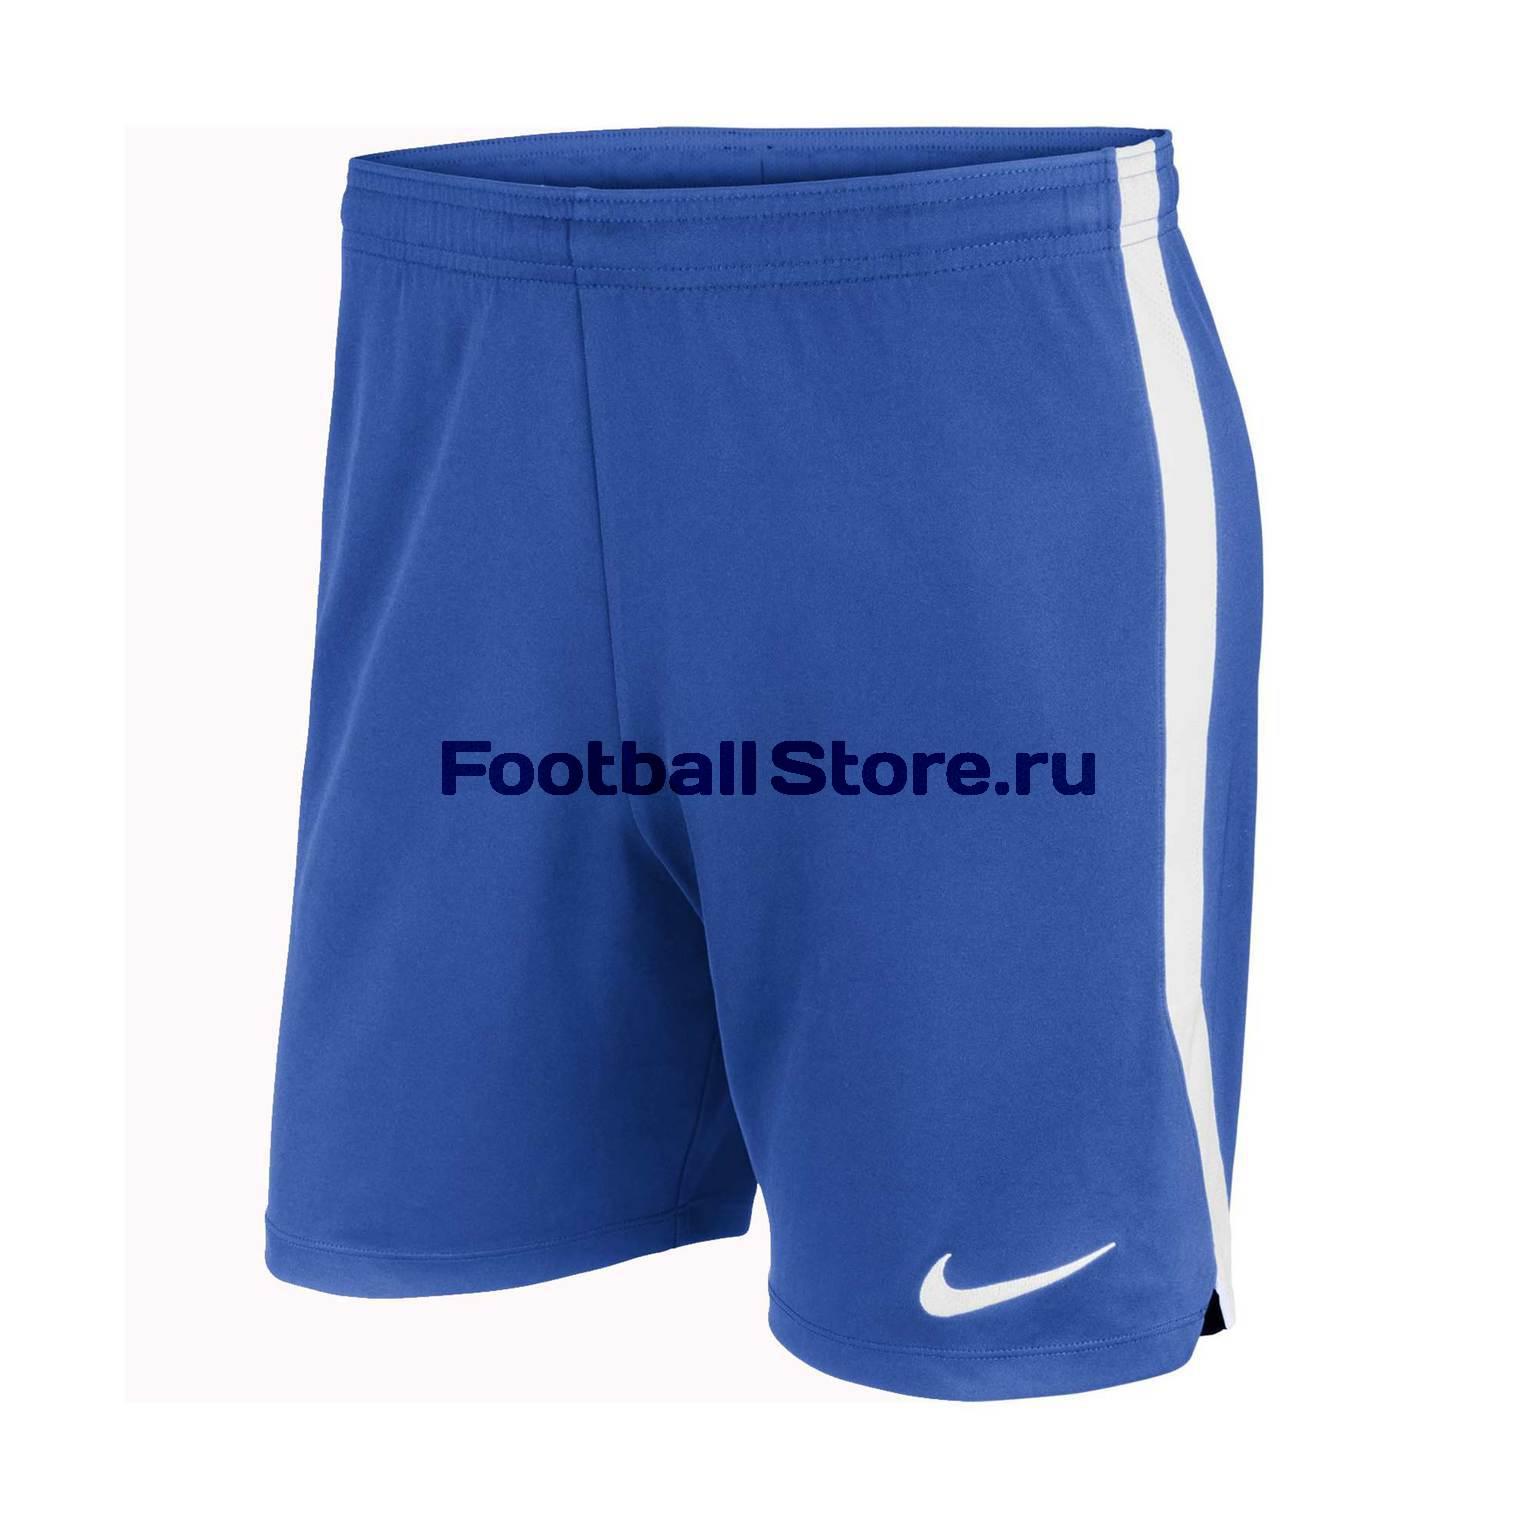 42e157a0 Шорты Nike Dry Classic AJ1235-463 – купить в интернет магазине ...